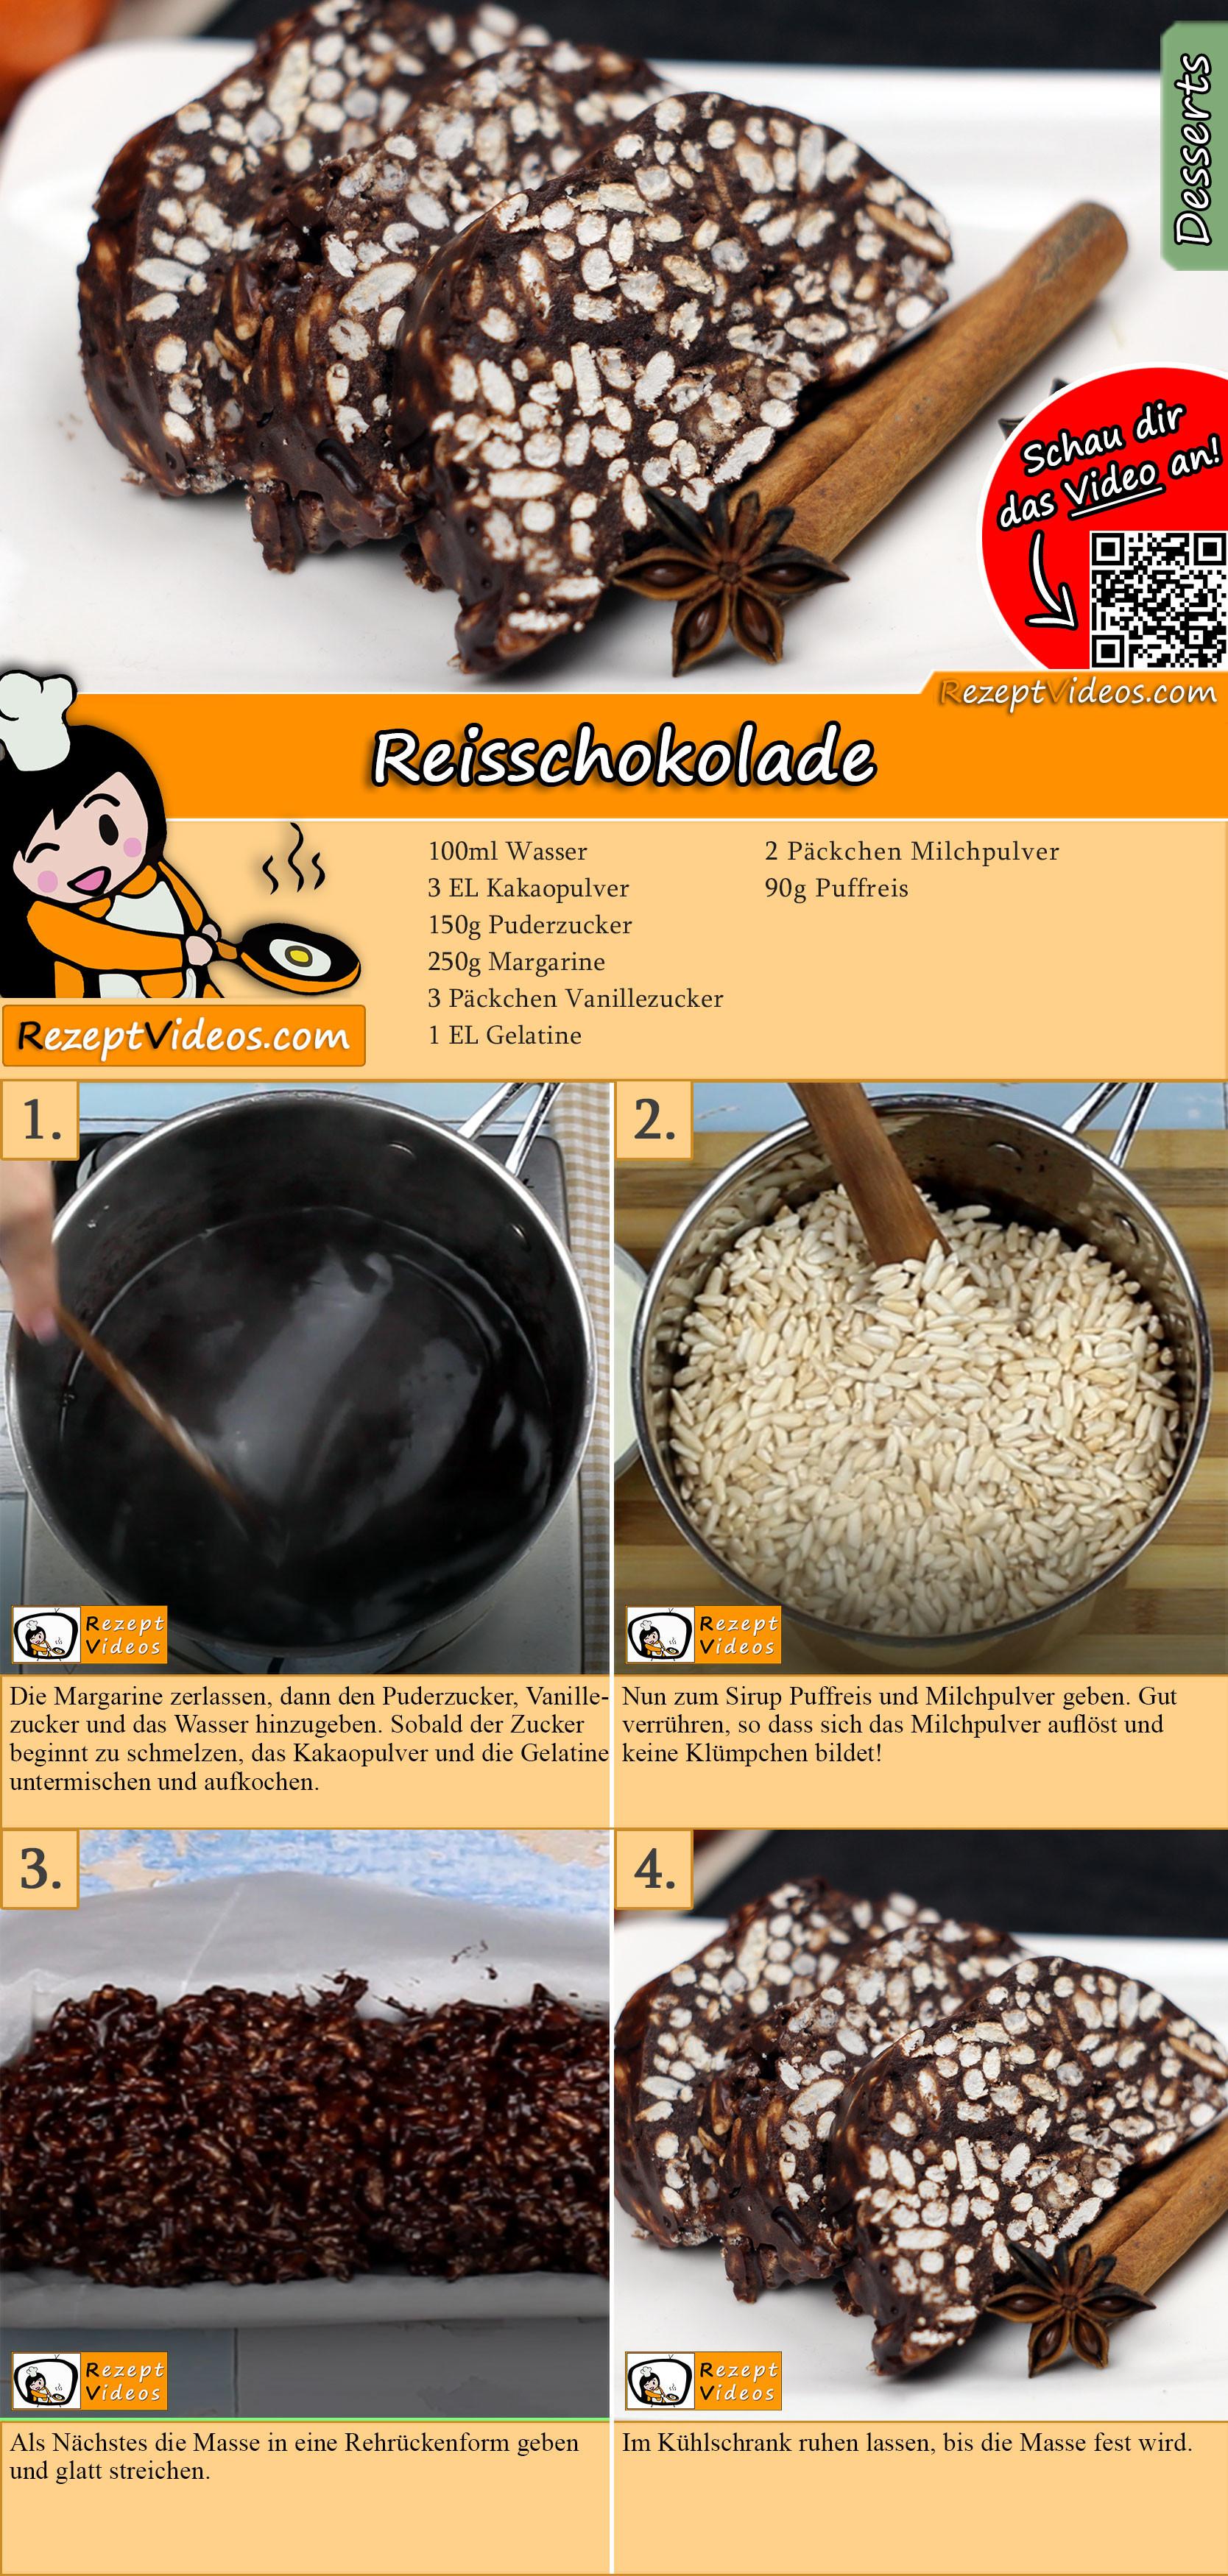 Reisschokolade Rezept mit Video